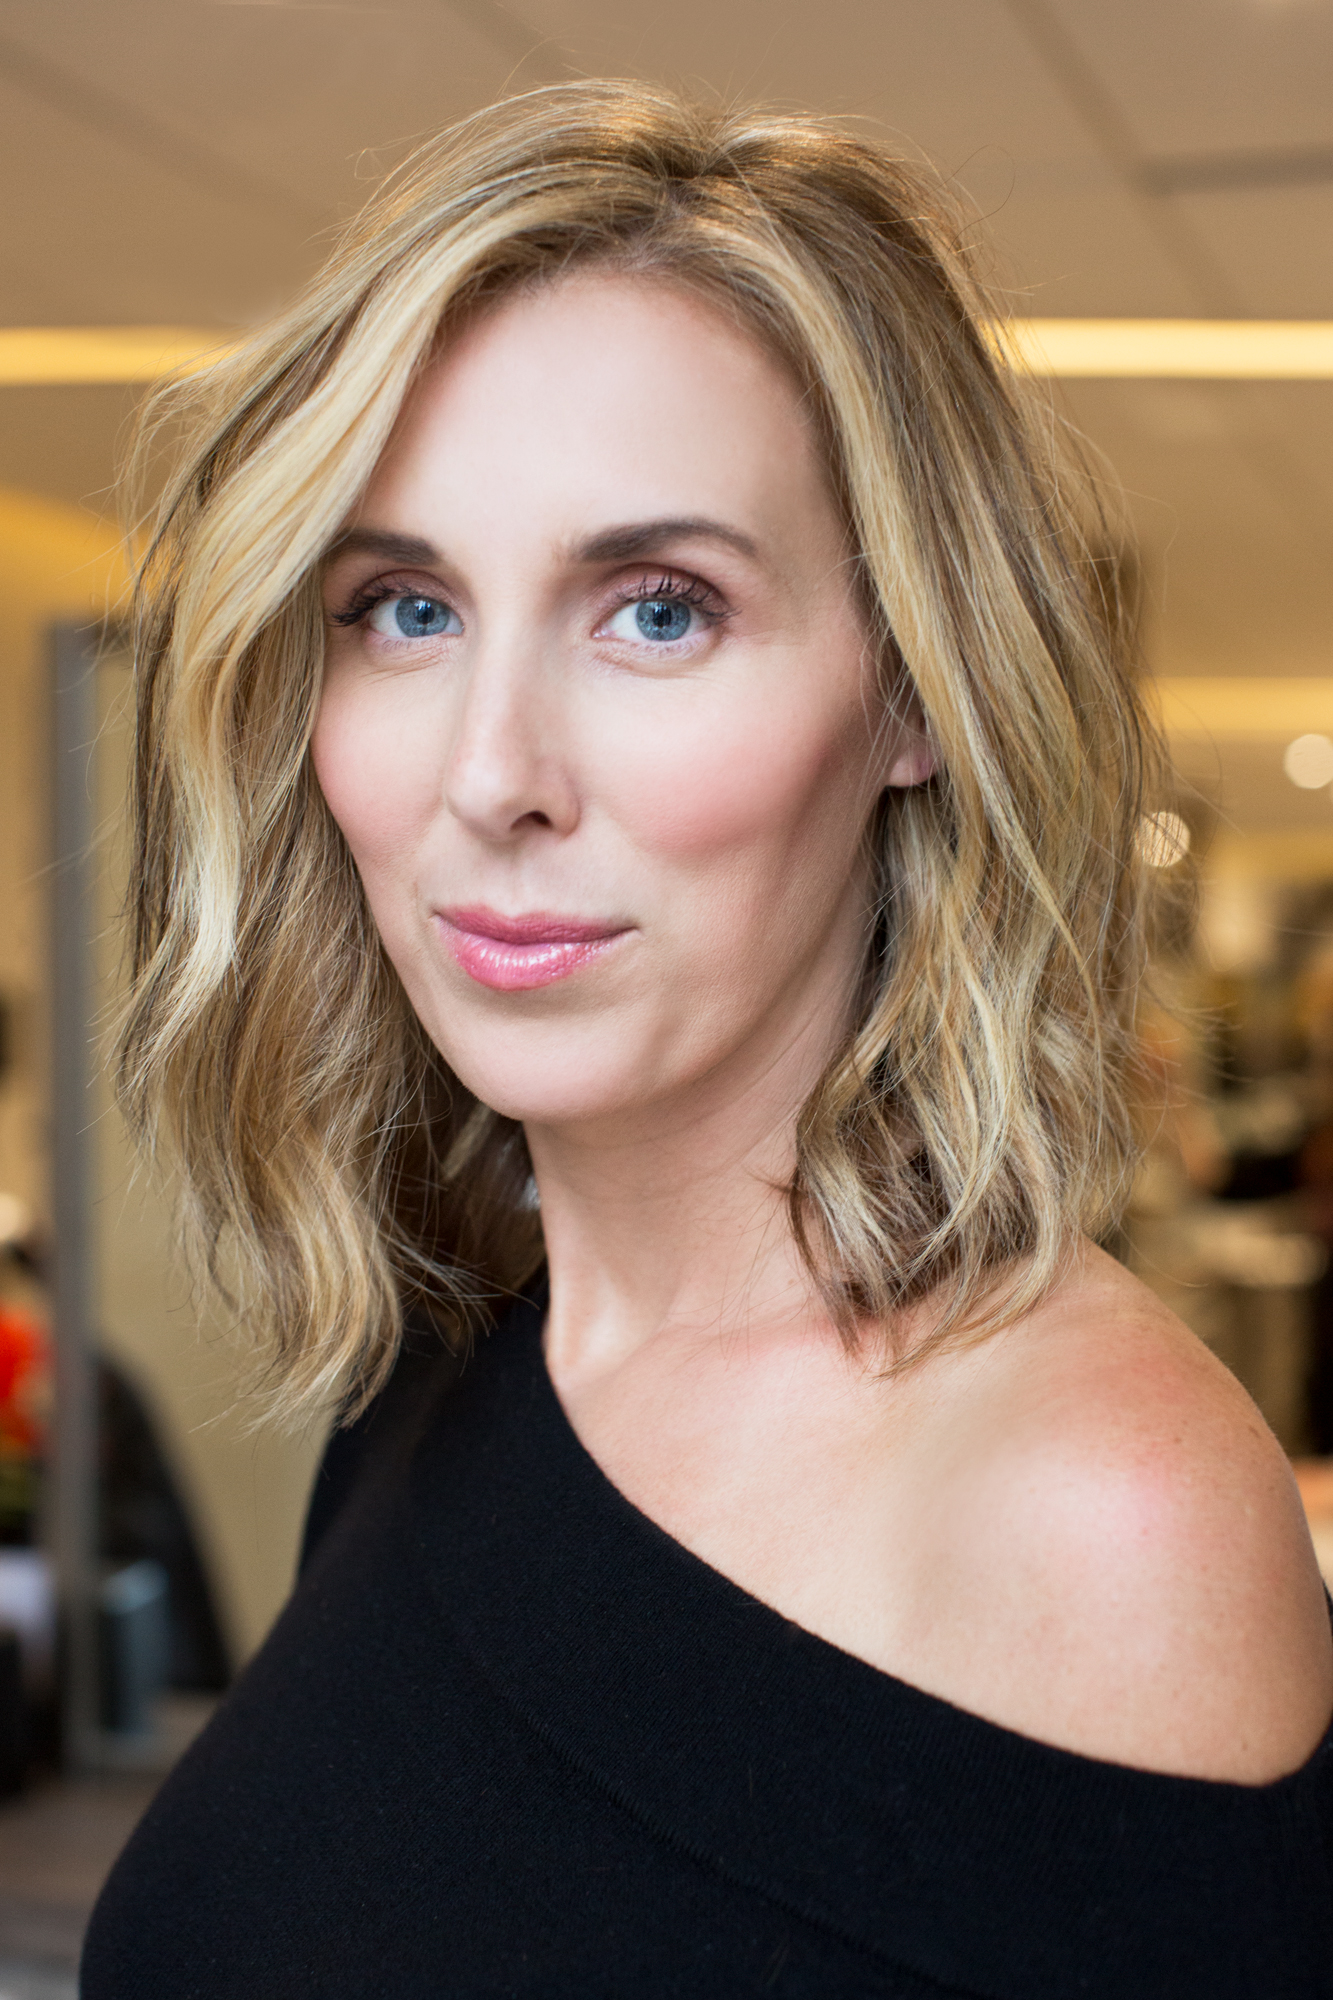 Best Mom Haircuts : haircuts, Haircut':, Short,, Stylish, Maintain